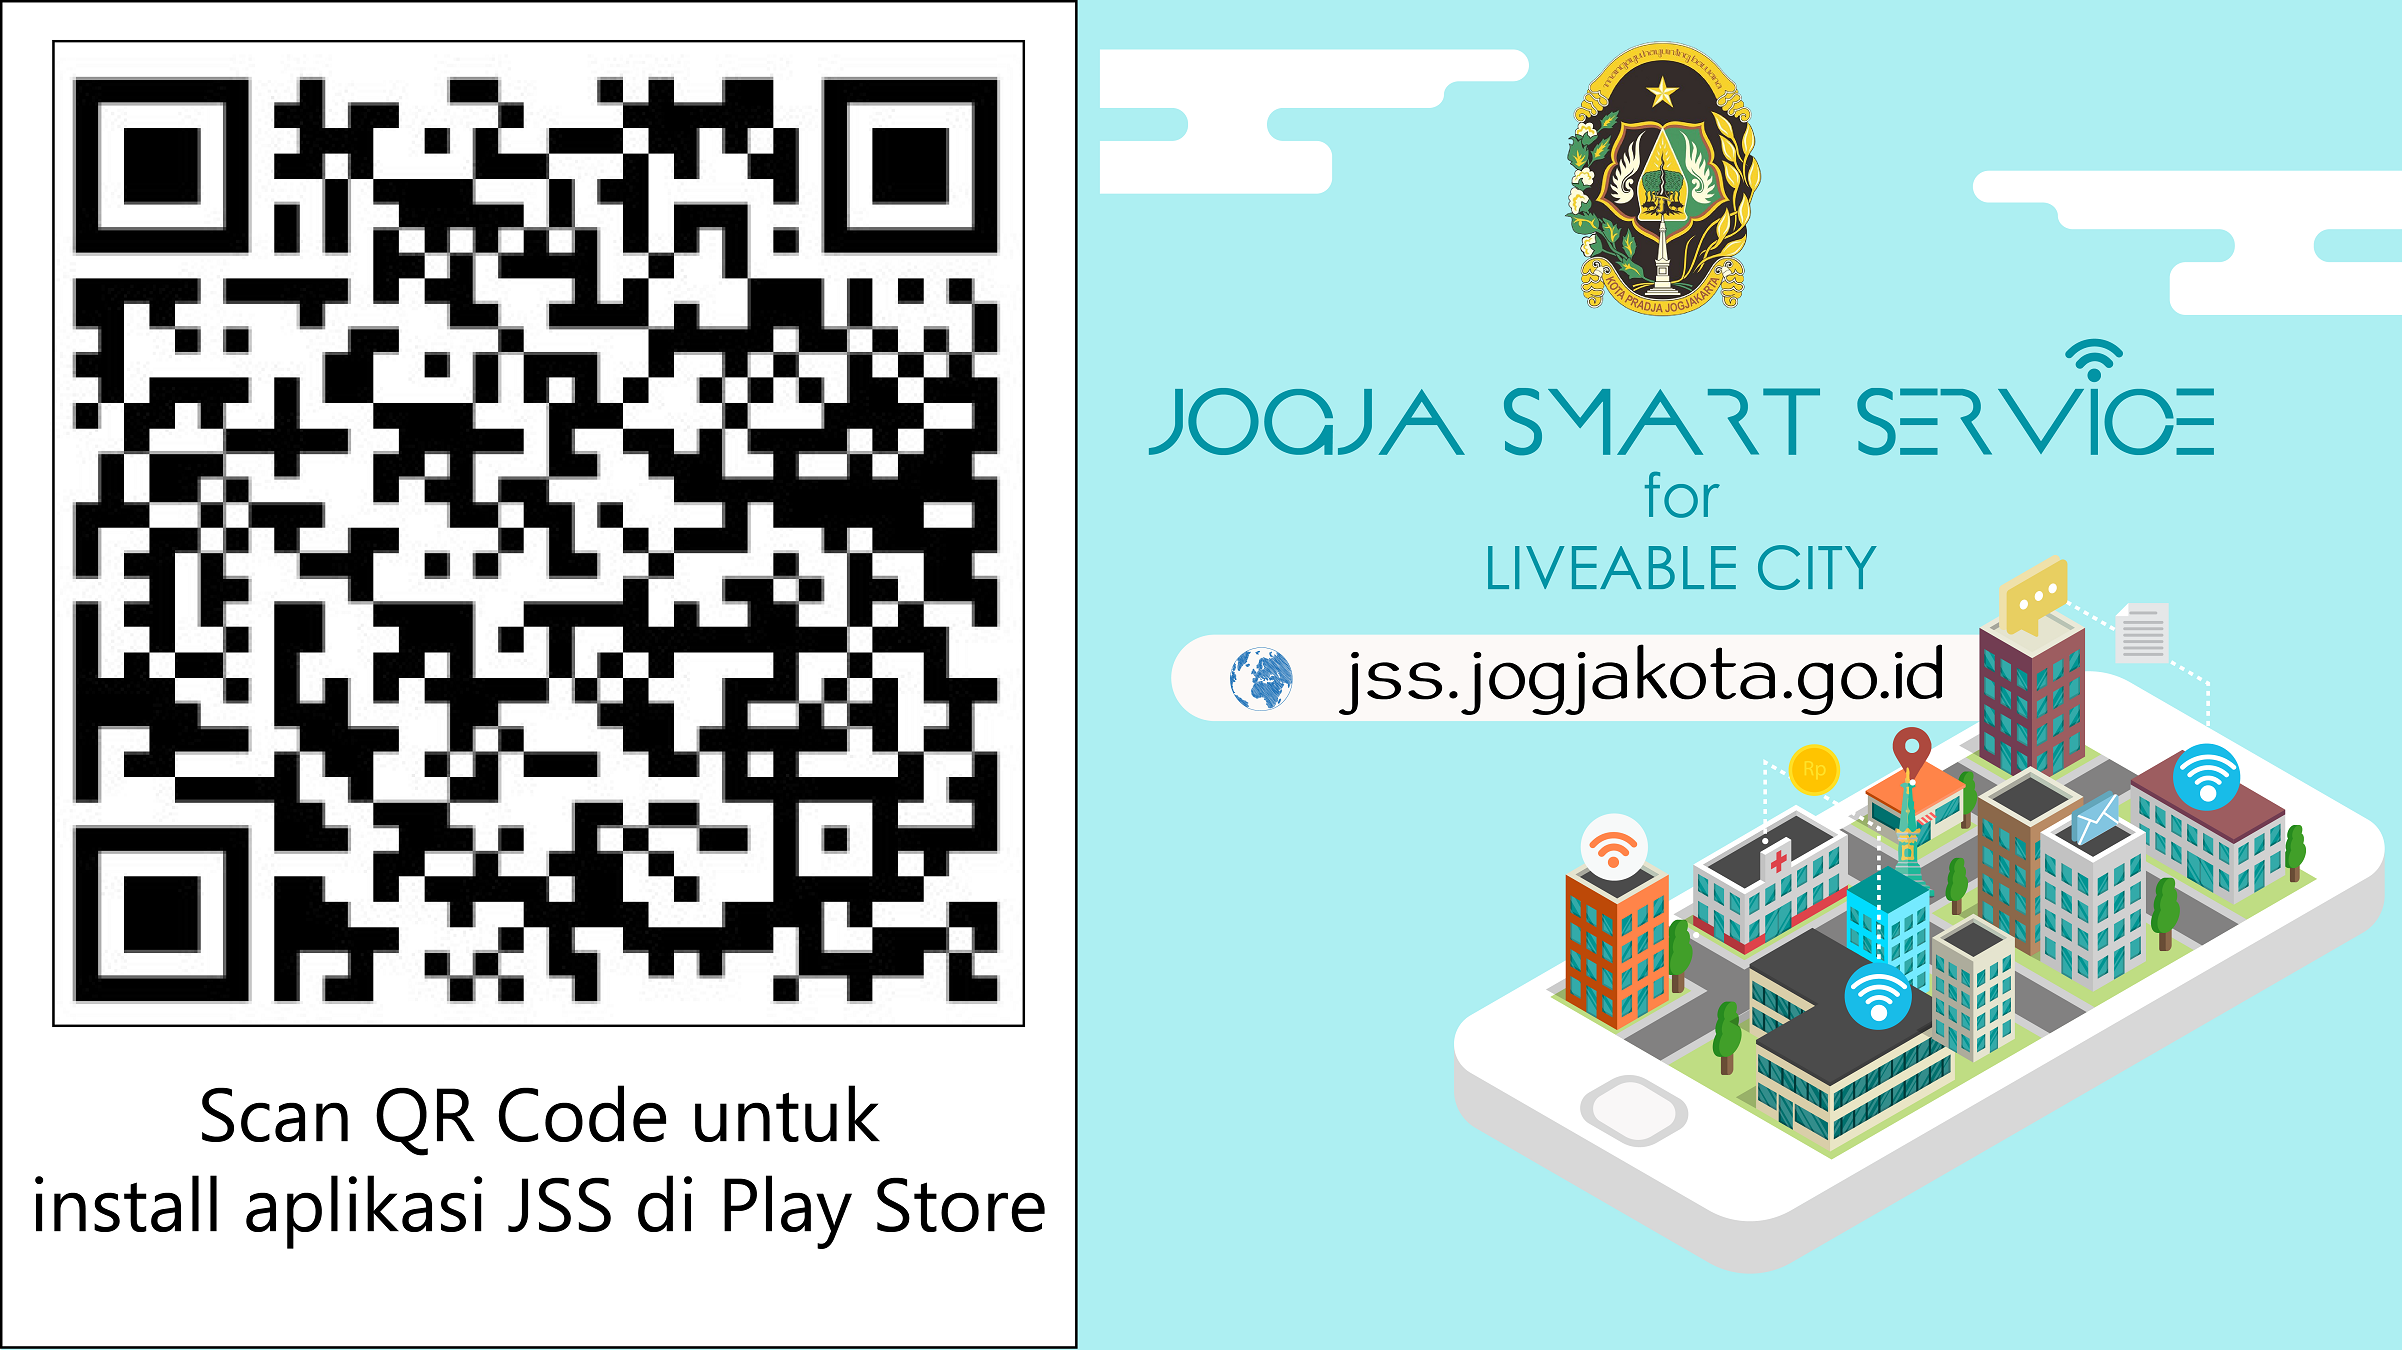 Portal Jogja Smart Service